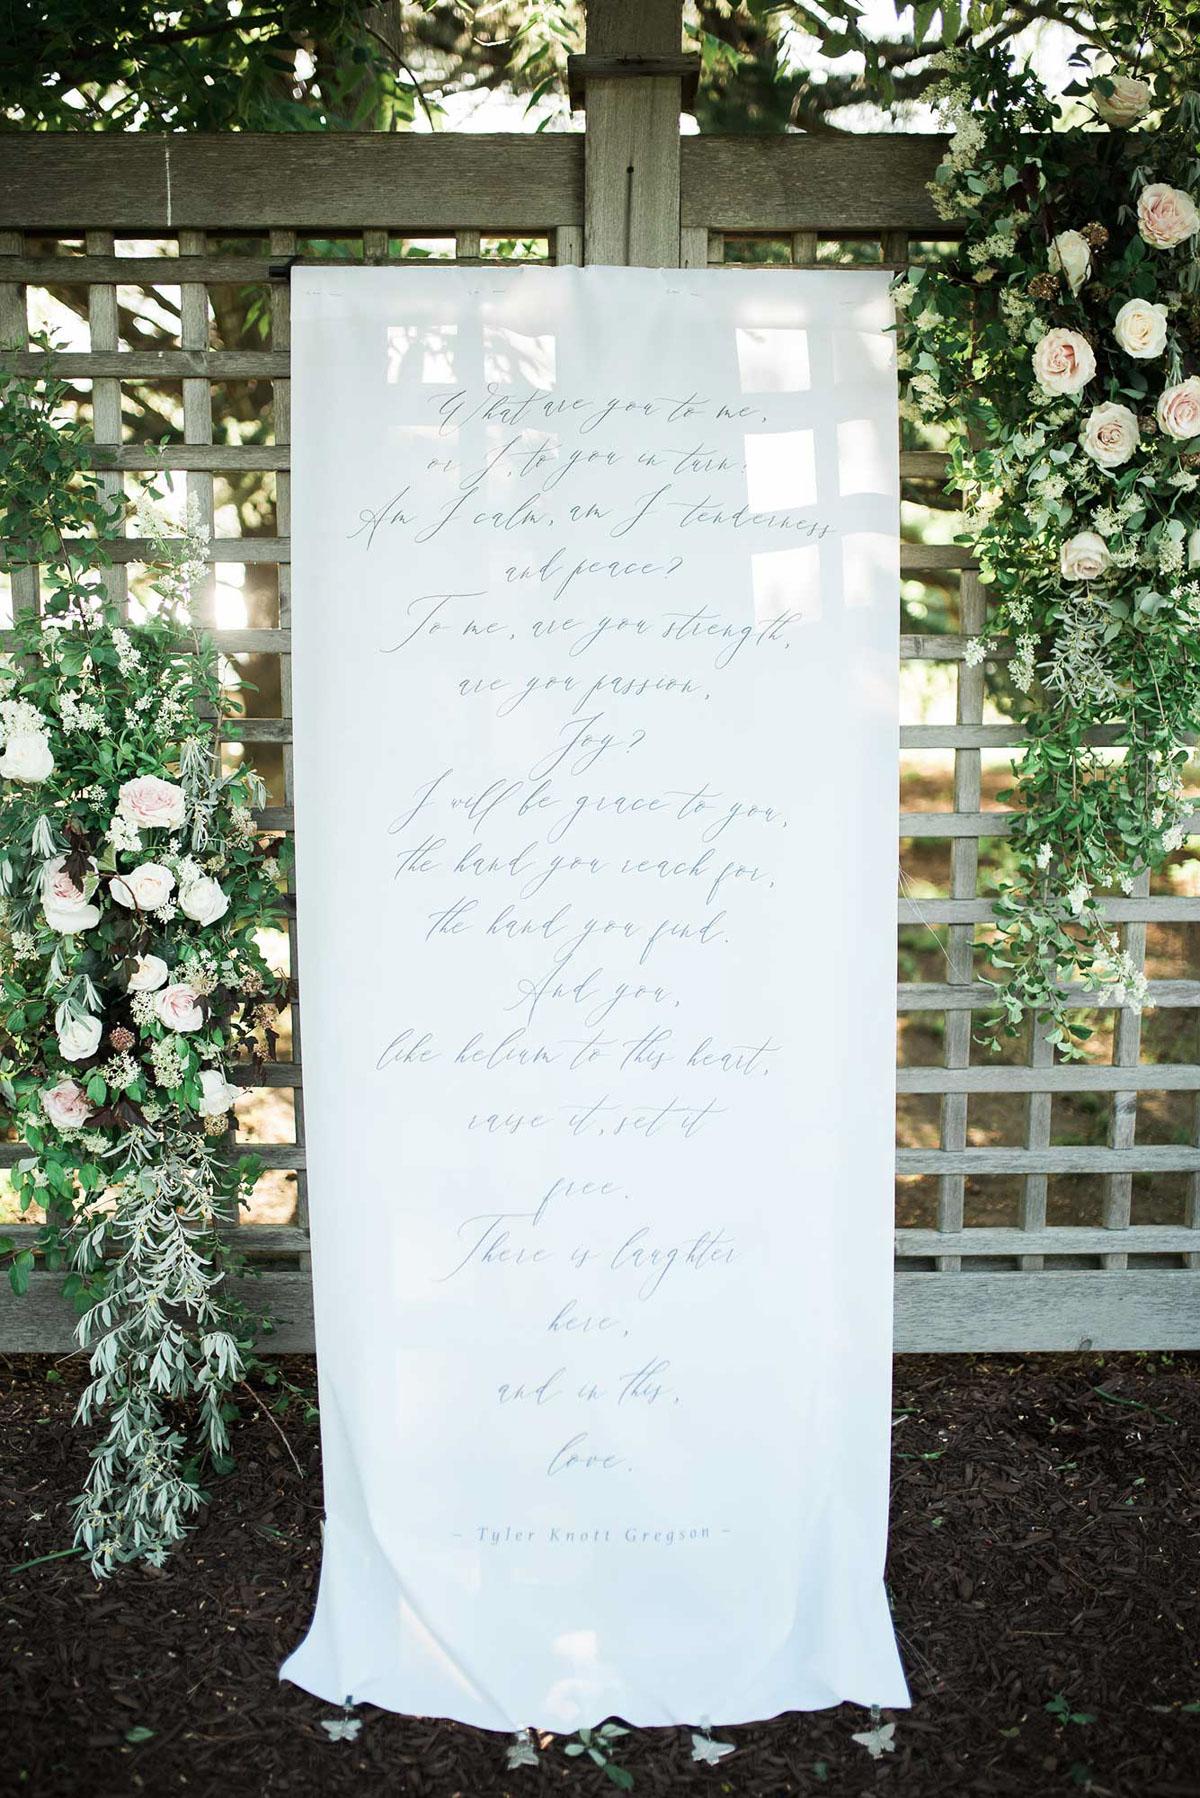 destiny-dawn-photography-vineyard-bride-swish-list-knollwood-golf-and-country-club-ancaster-wedding-editorial-12.jpg